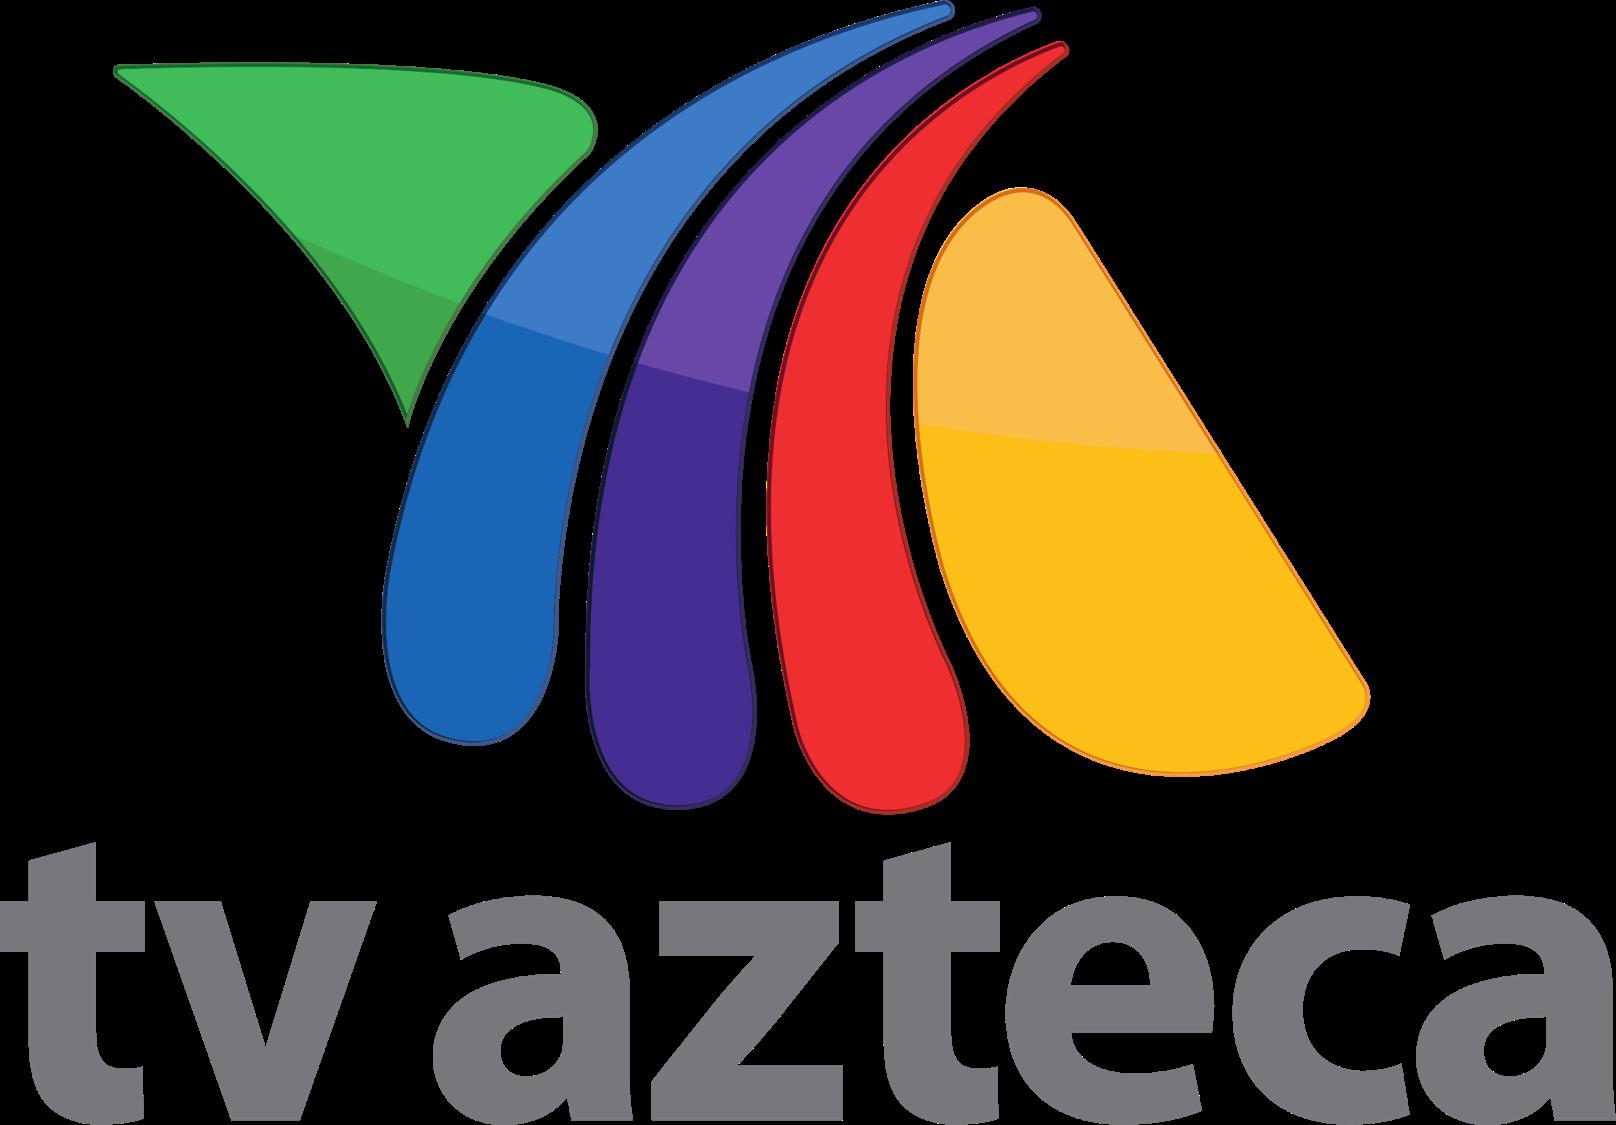 Archivo:Logotipo TV Azteca 2015.png